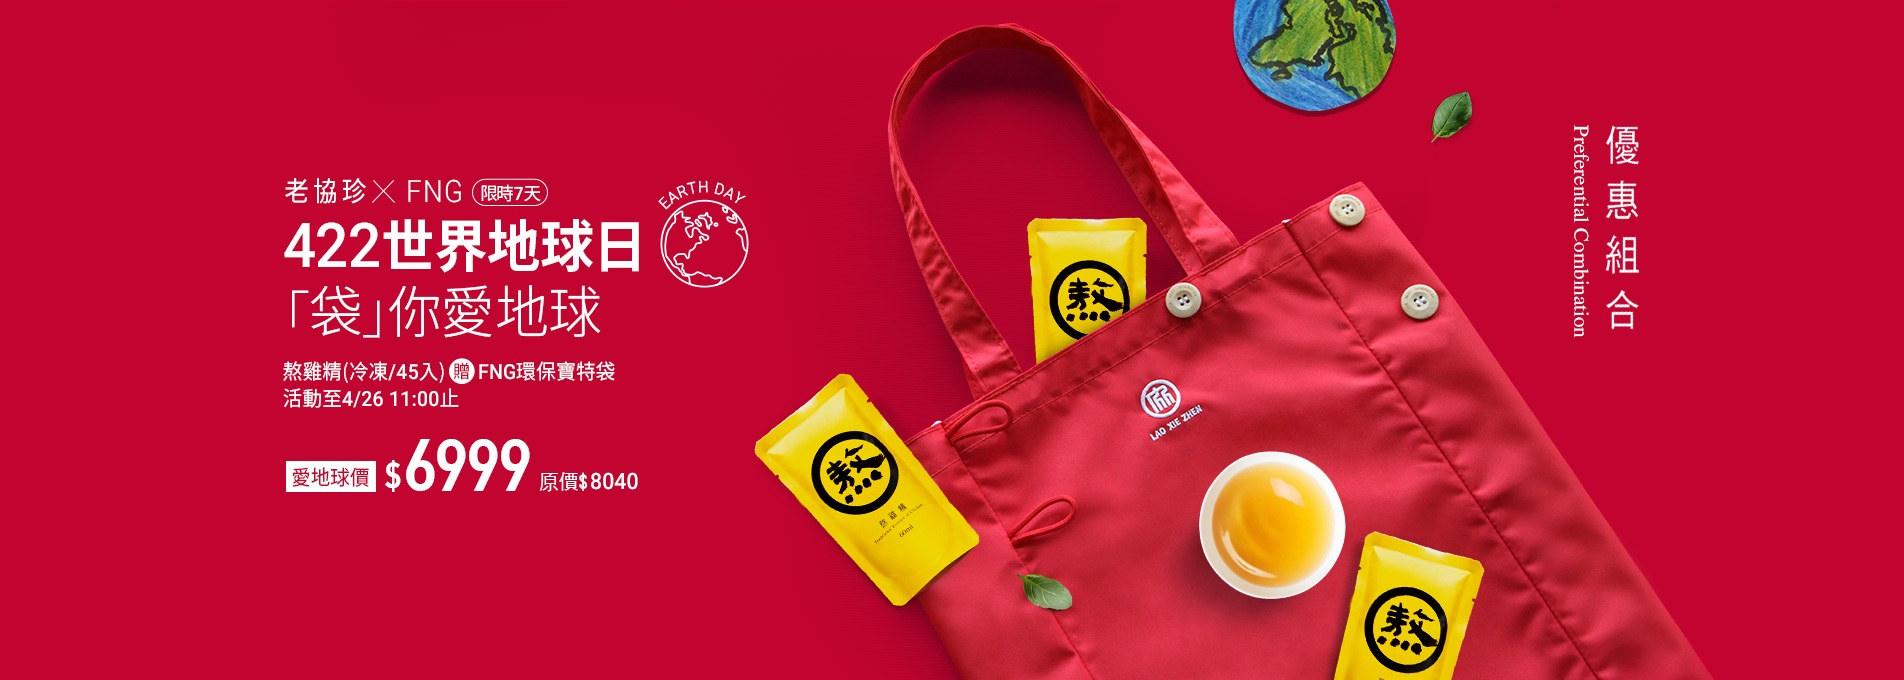 熬雞精(冷凍45入)贈FNG環保寶特袋